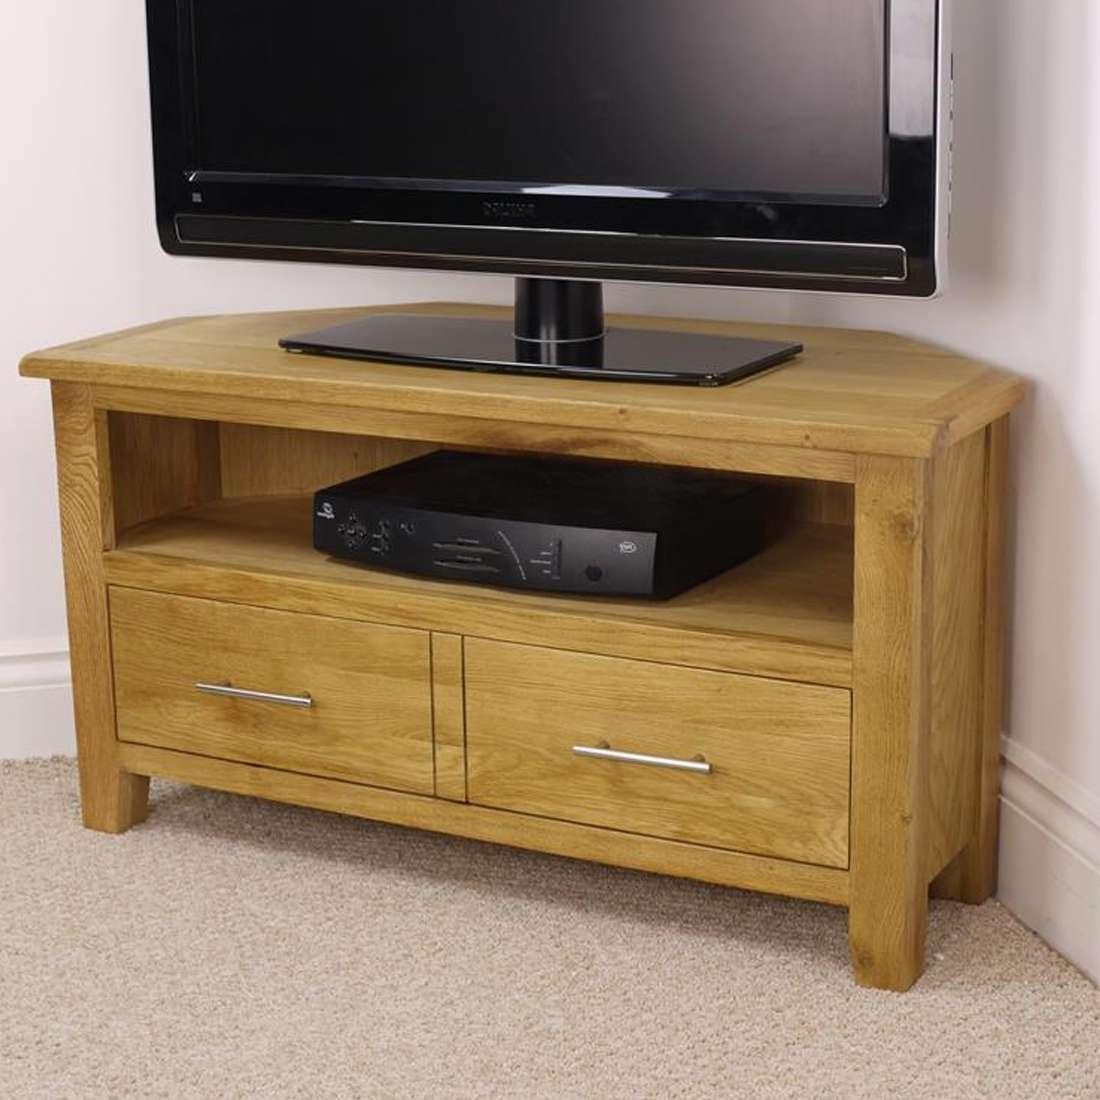 Nebraska Modern Oak Corner Tv Unit / Solid Wood Tv Stand / Oiled With Regard To Corner Oak Tv Stands For Flat Screen (View 11 of 15)